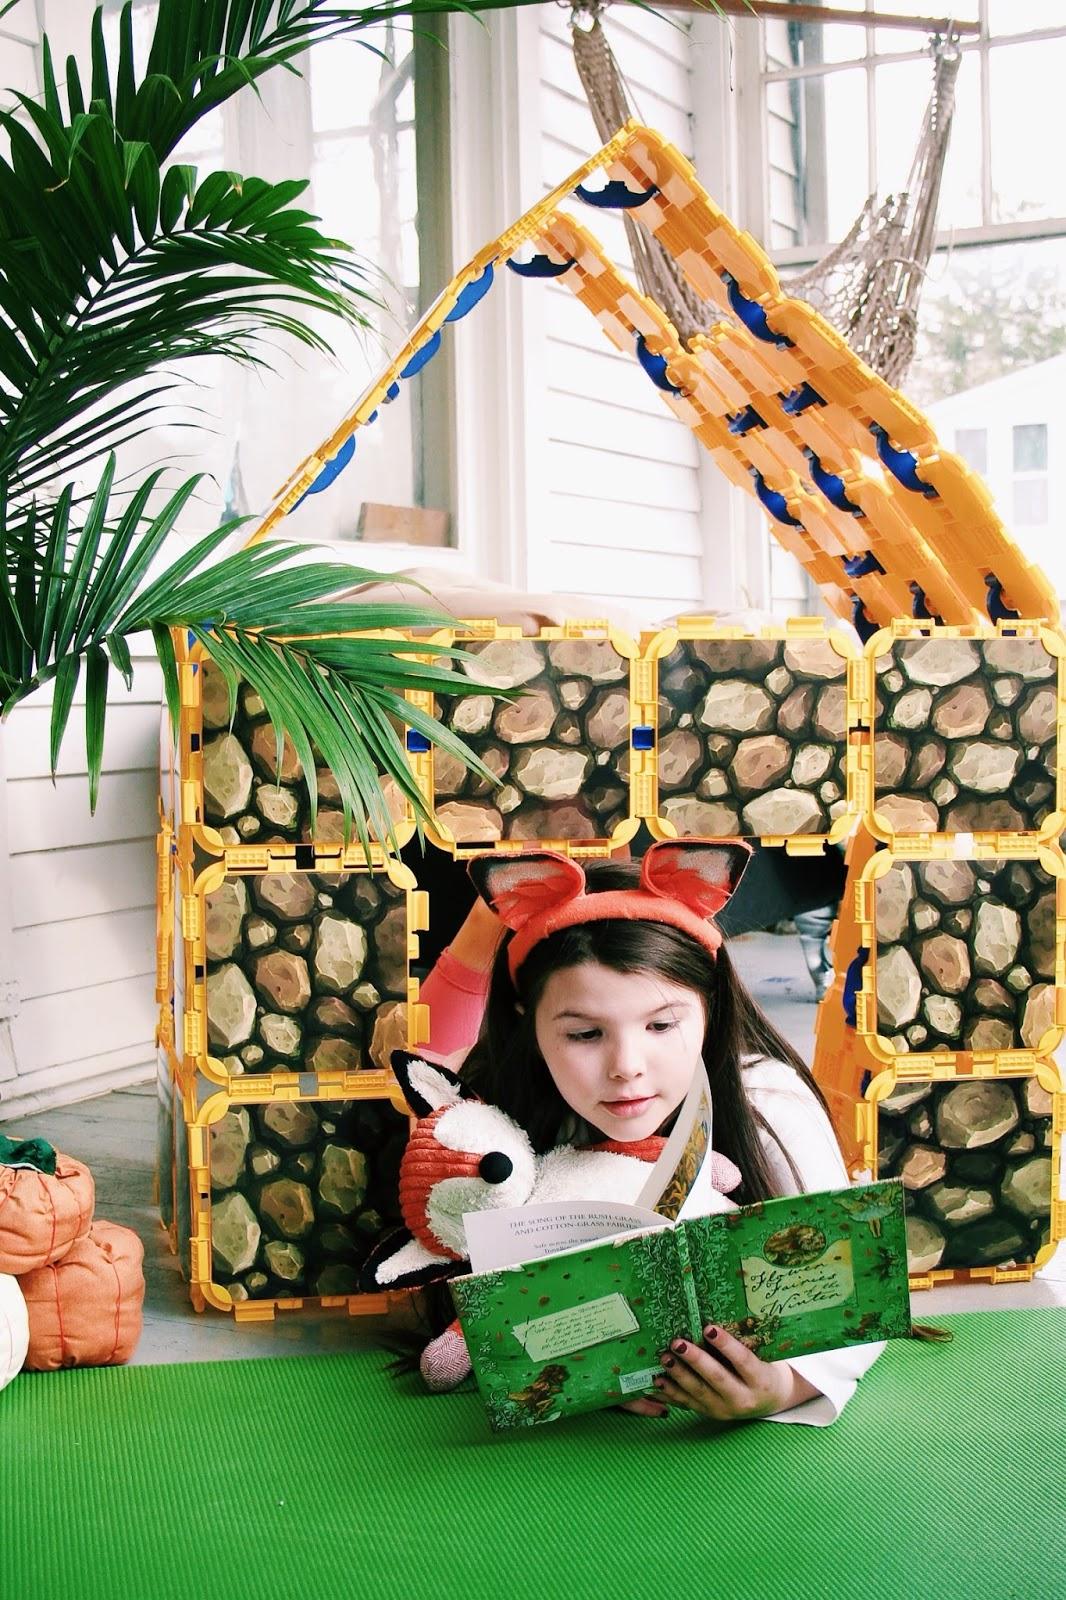 From www.sentimentalcynical.blogspot.com/